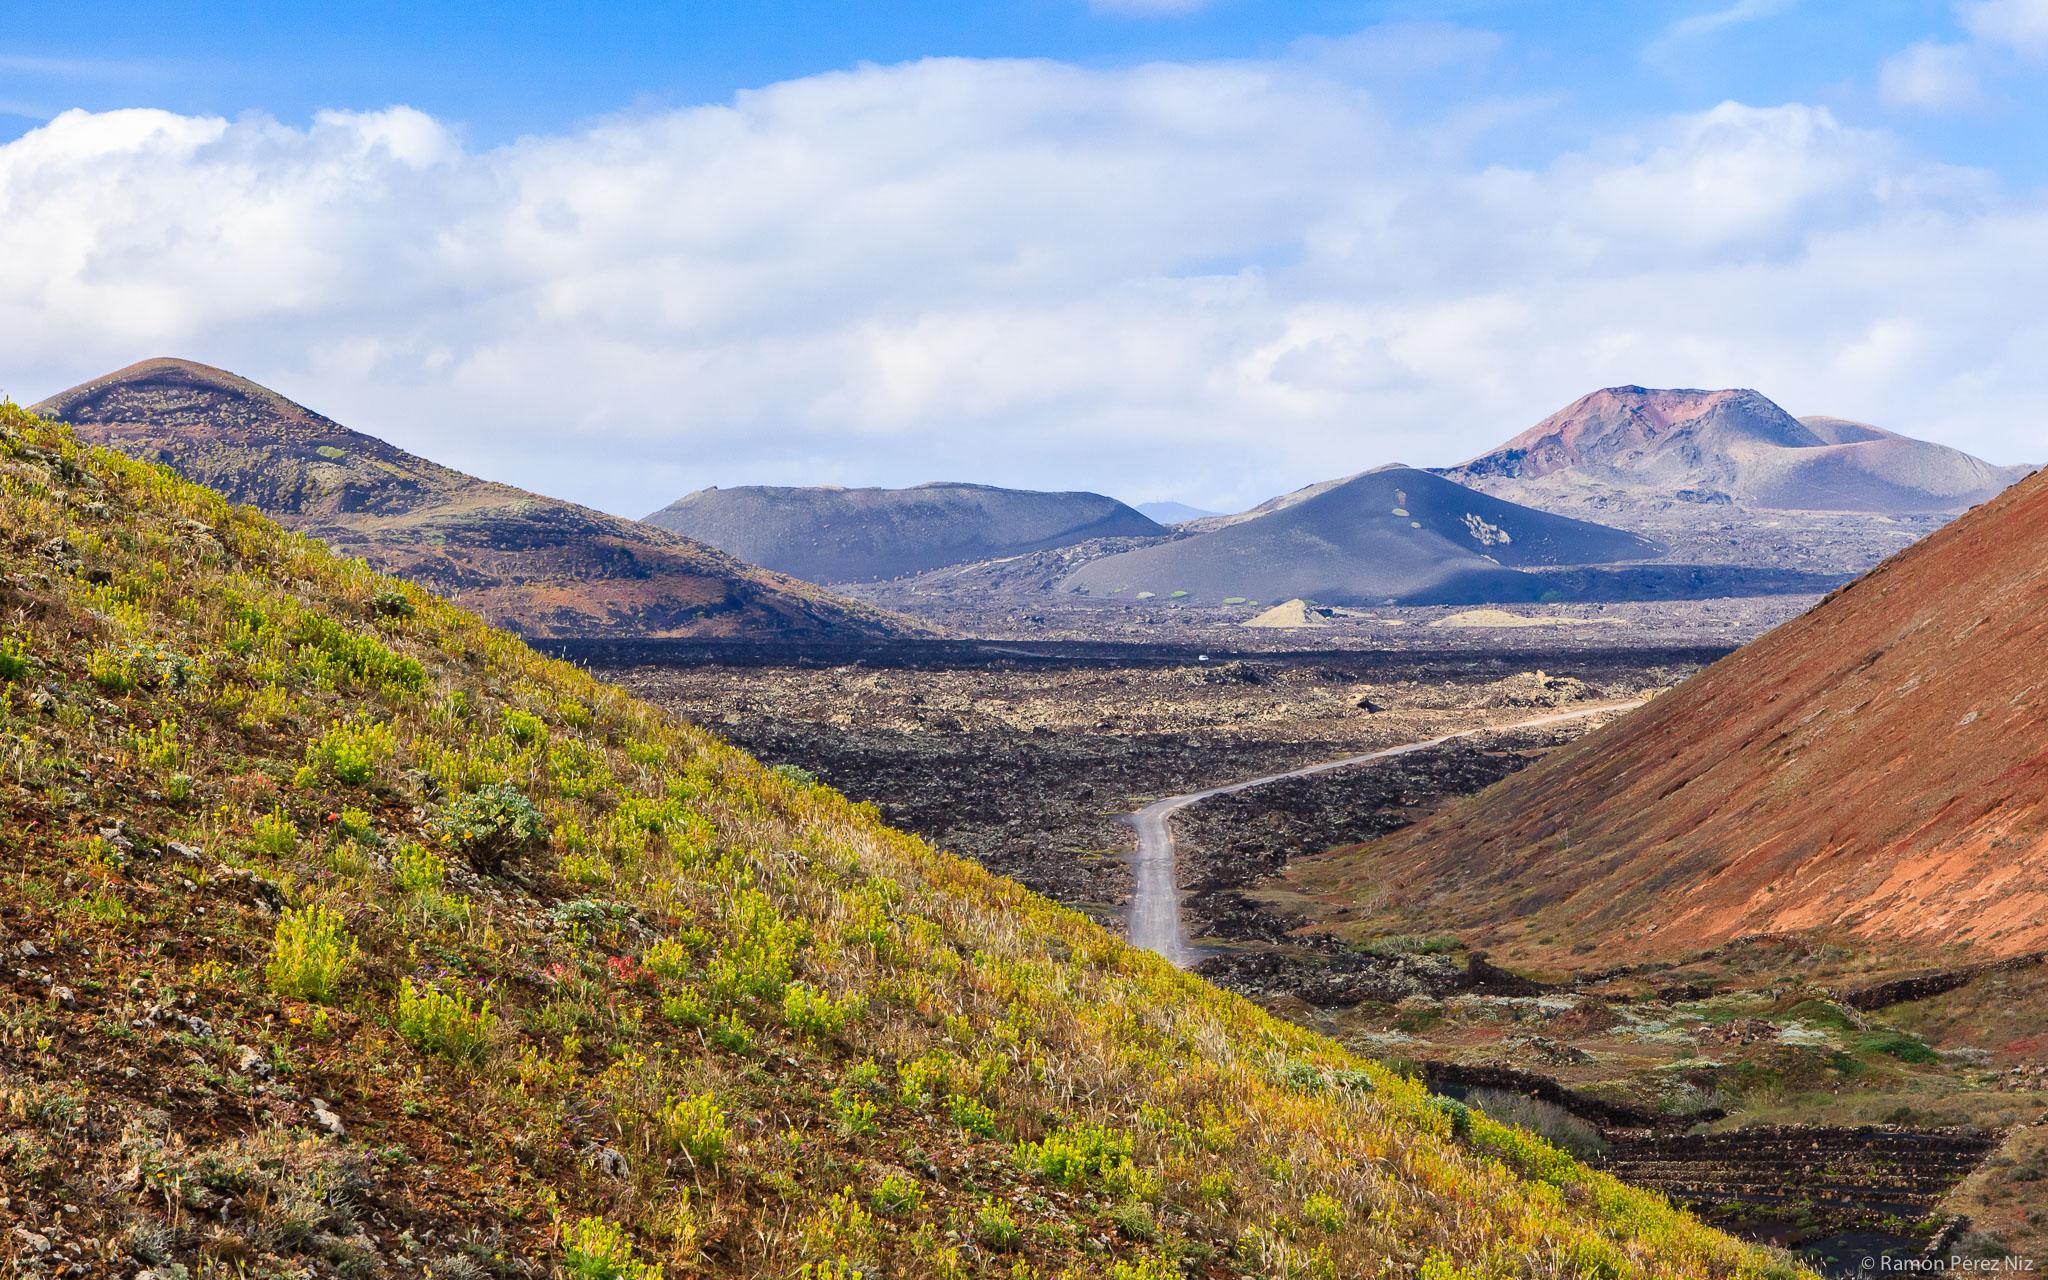 Foto de Ramón Pérez Niz, volcanes de Lanzarote